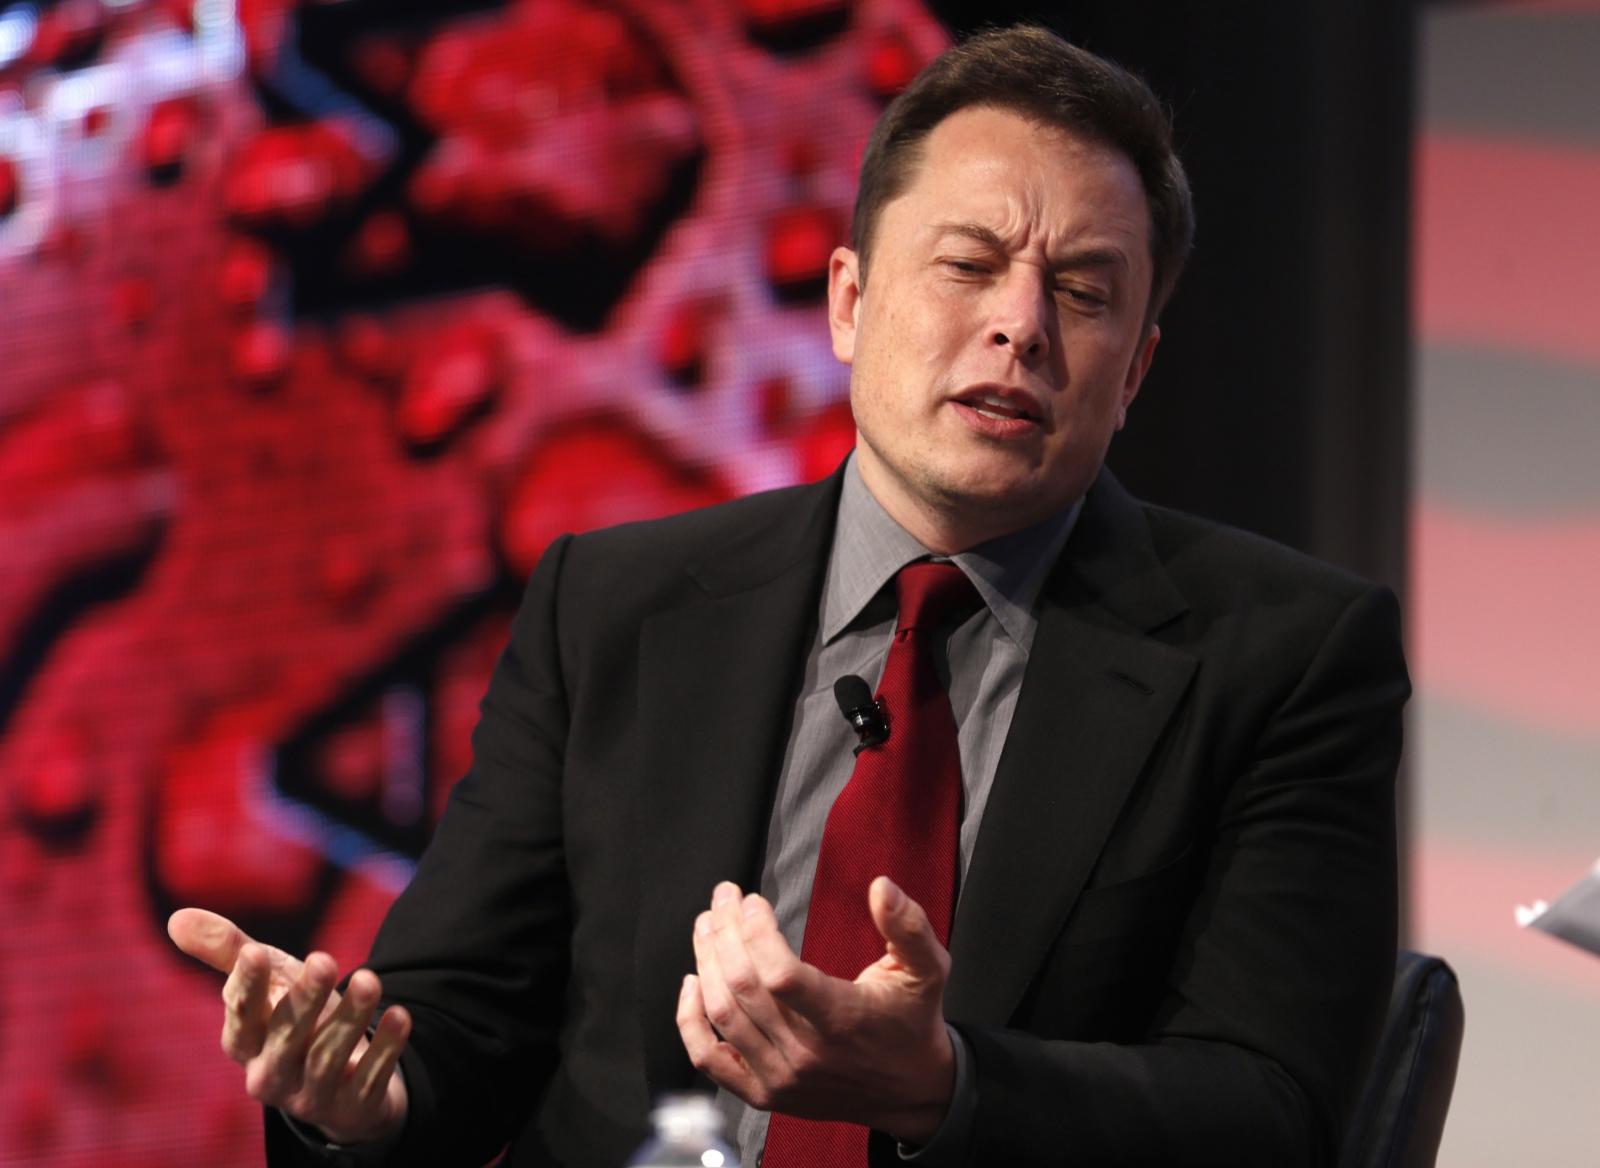 Elon Musk Tesla CEO